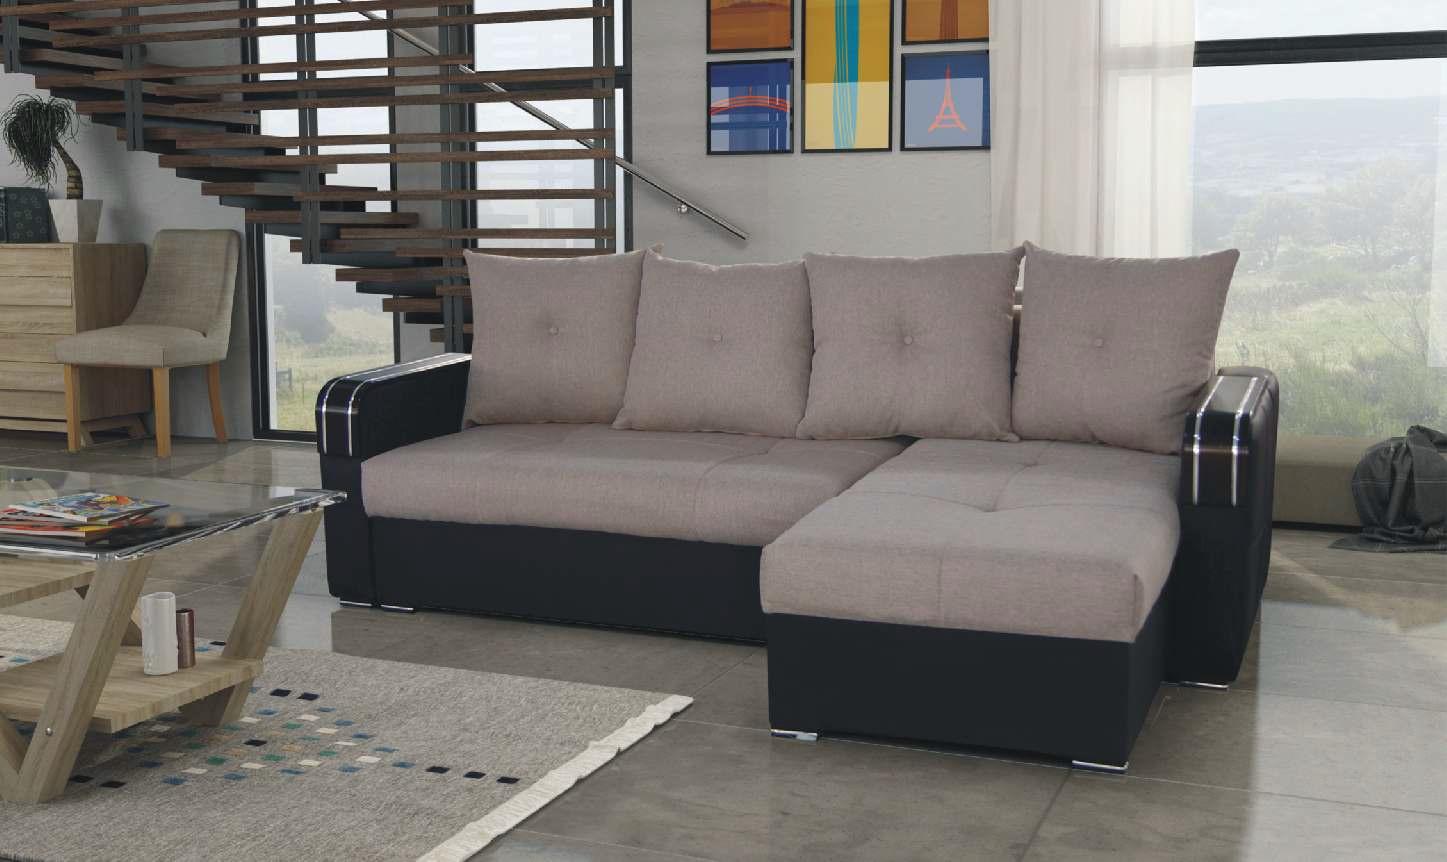 Vegas beige sectional sofa by skyler designs for Sectional sofa las vegas